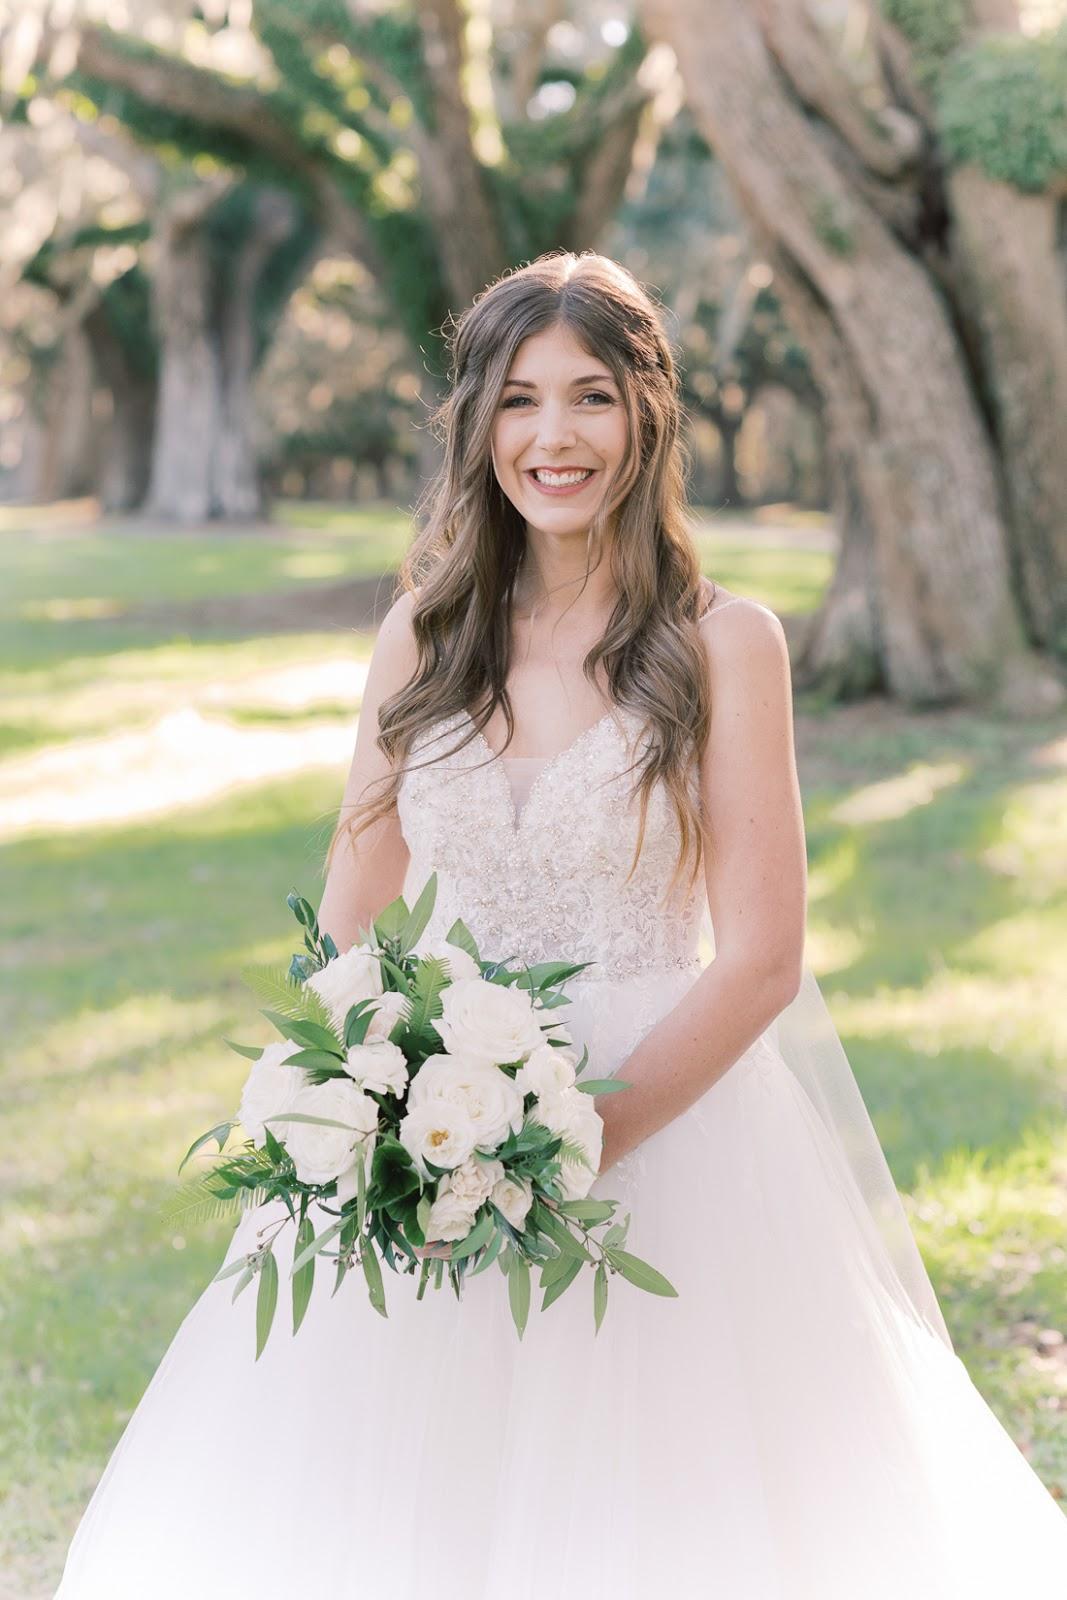 My Wedding Dress Details - Chasing Cinderella